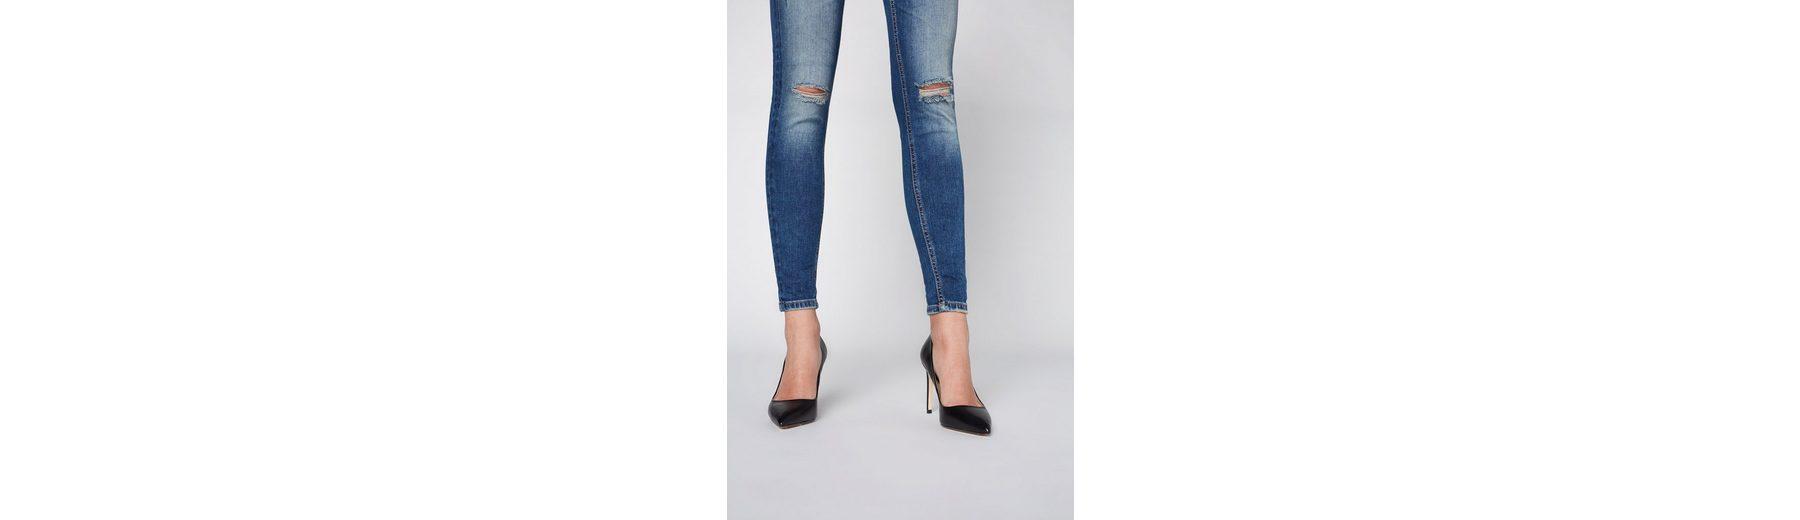 COLORADO DENIM C948 ANKLE Candiani Damen Jeans Billige Visum Zahlung 5i5ZH